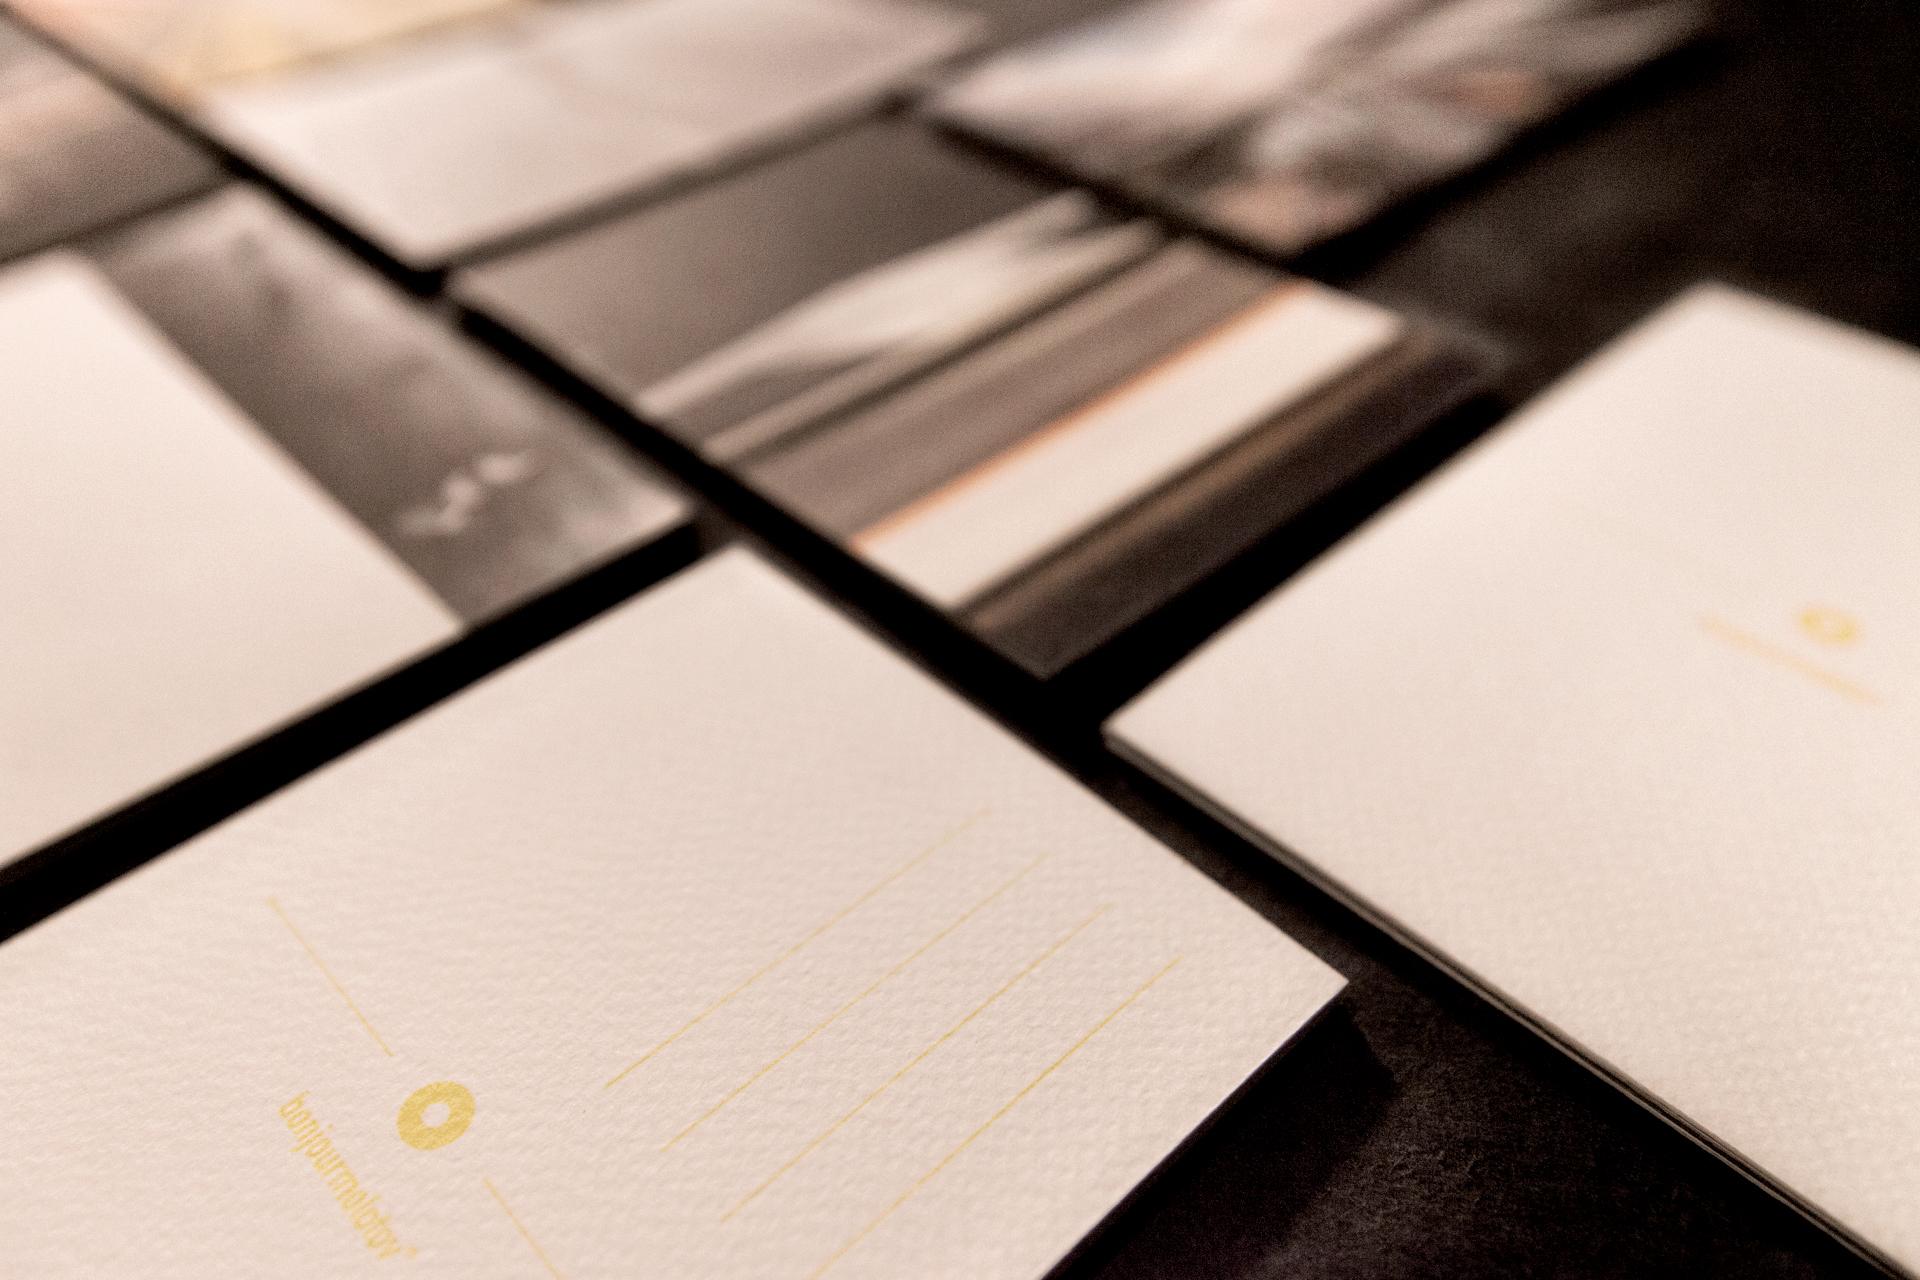 In Transit bonjourmolotov André Gigante Experimenta Design 2015 EXD15 Photography Exhibition Exposição Fotografia Cooperativa Árvore 13 N.jpg